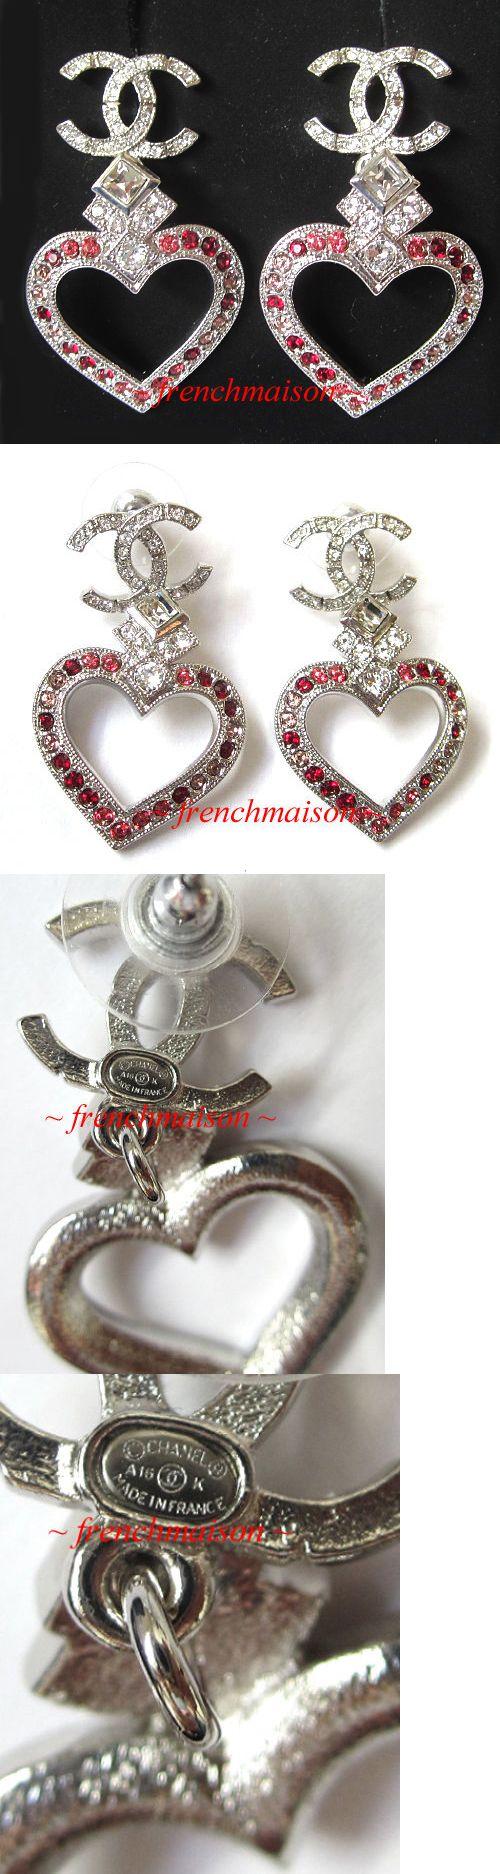 Earrings 50647: Authentic Chanel Cc Logo Earrings Silver Heart Love Dangle Crystal Gift New $525 -> BUY IT NOW ONLY: $475 on eBay!